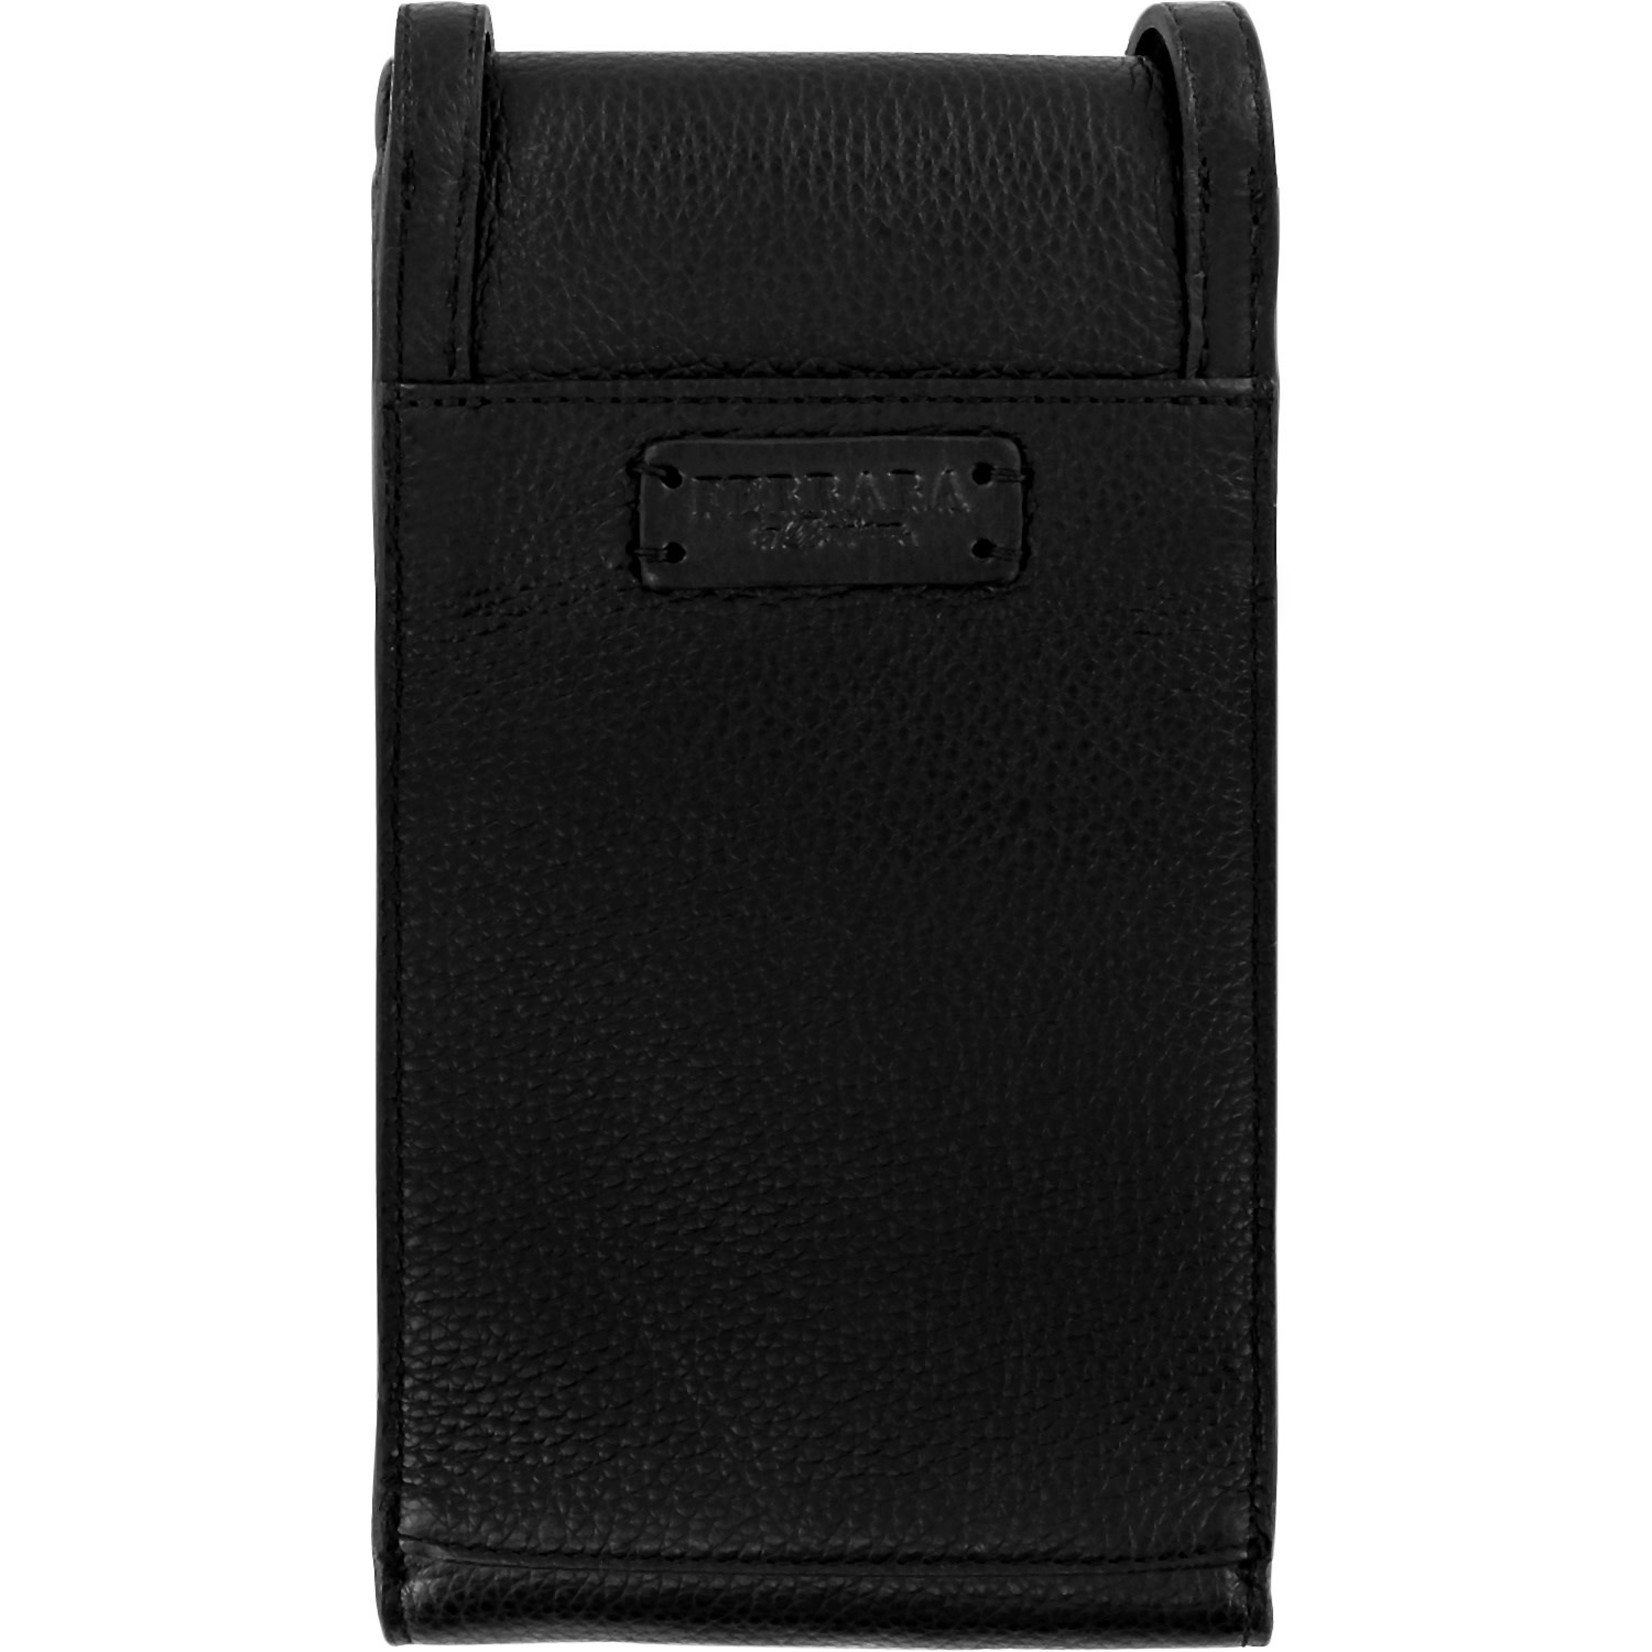 Brighton E53163 Ferrara Phone Organizer - Black